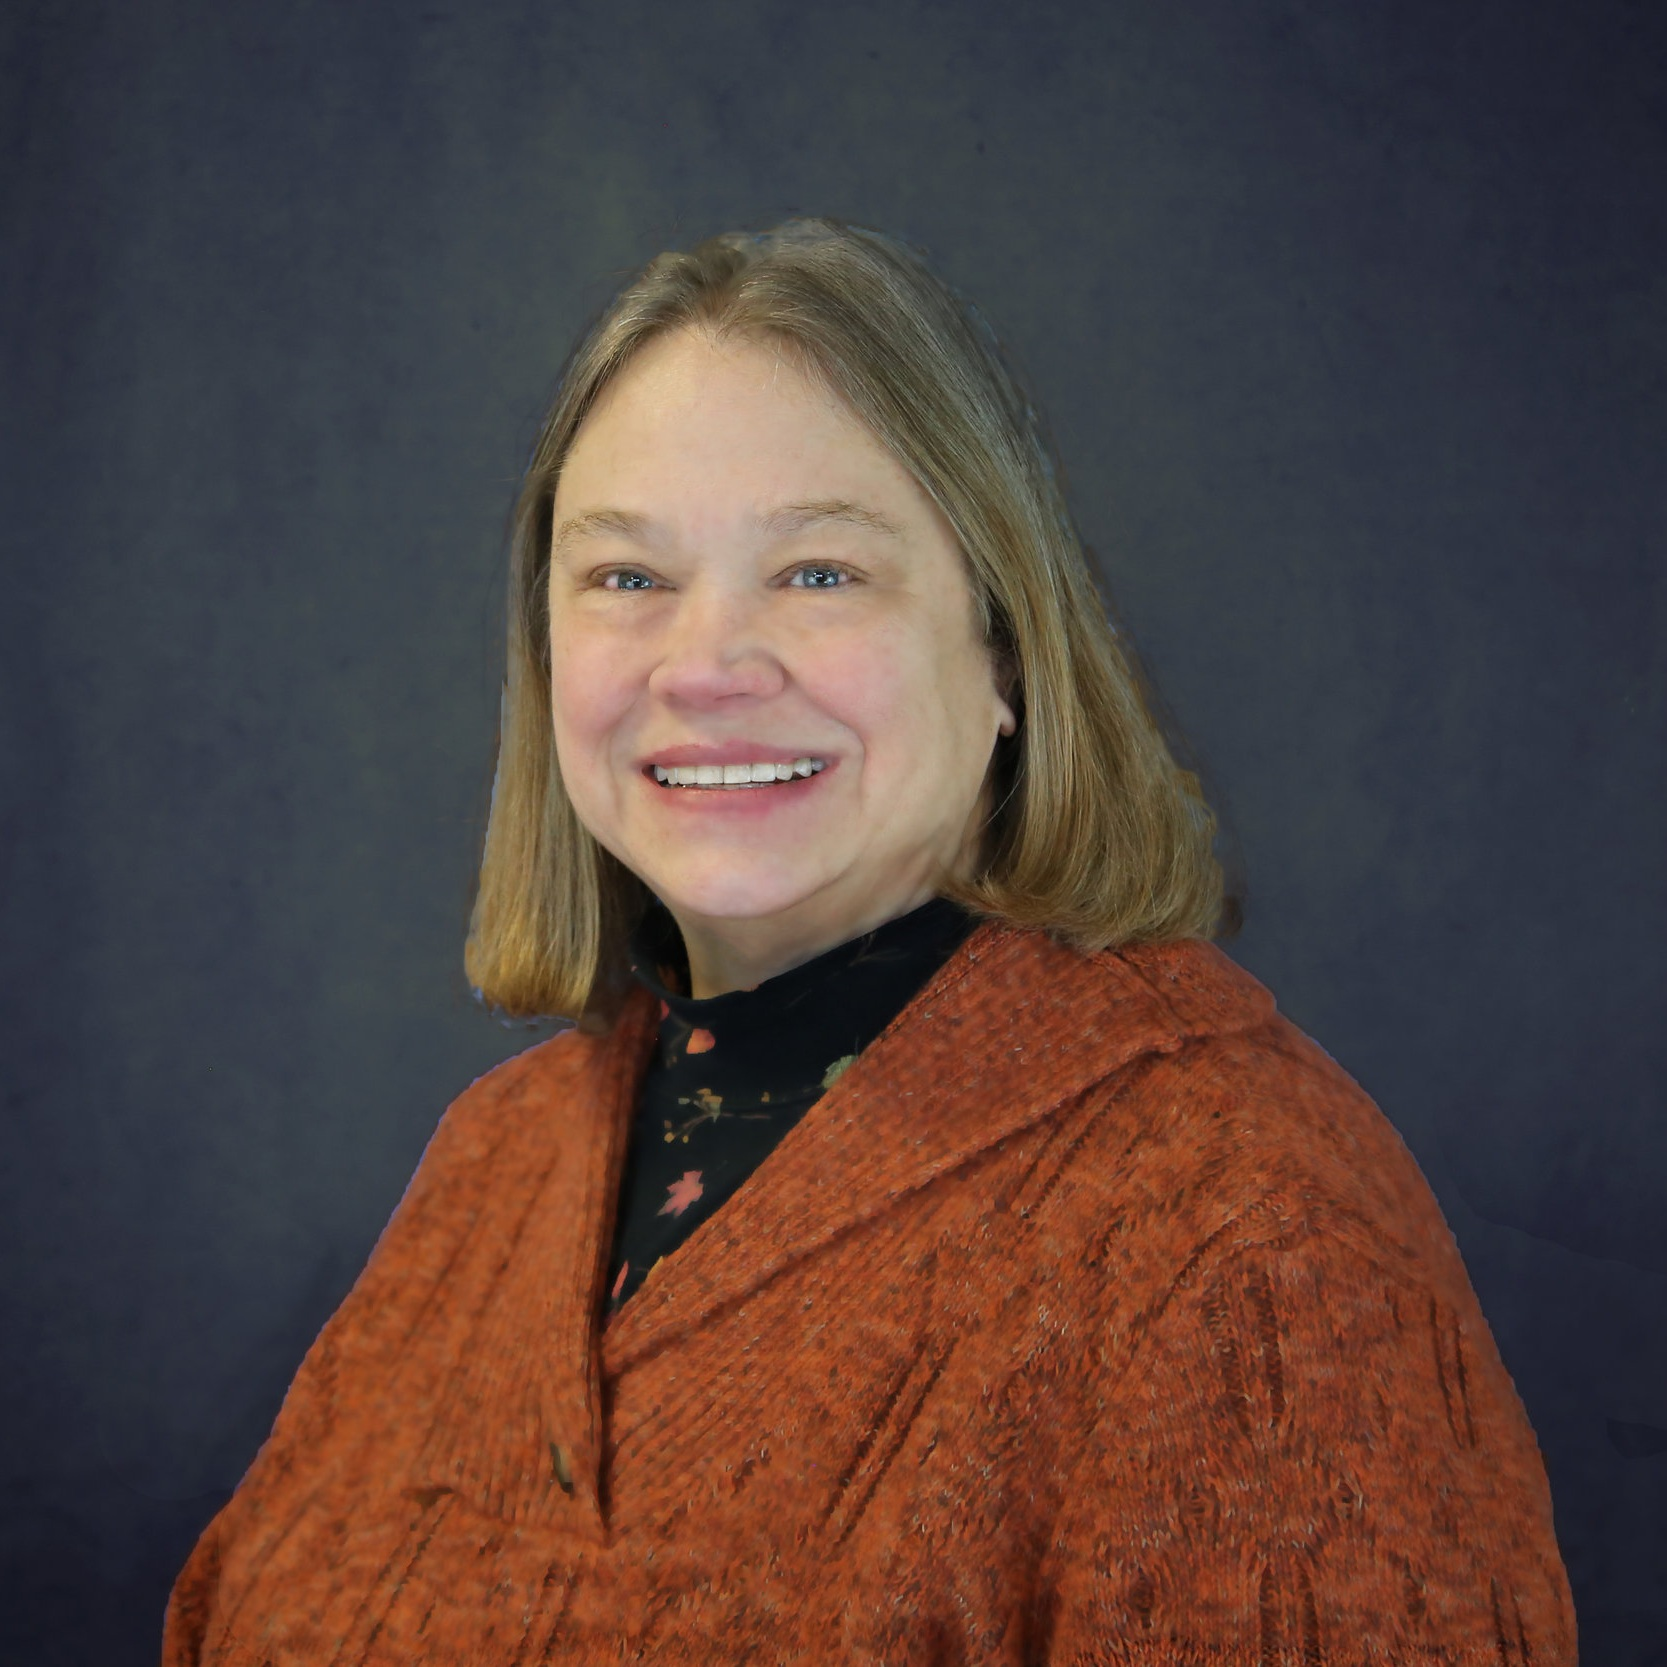 Darlene Seelos - Senior LinkAge Line® Programs Assistant - Return to Community